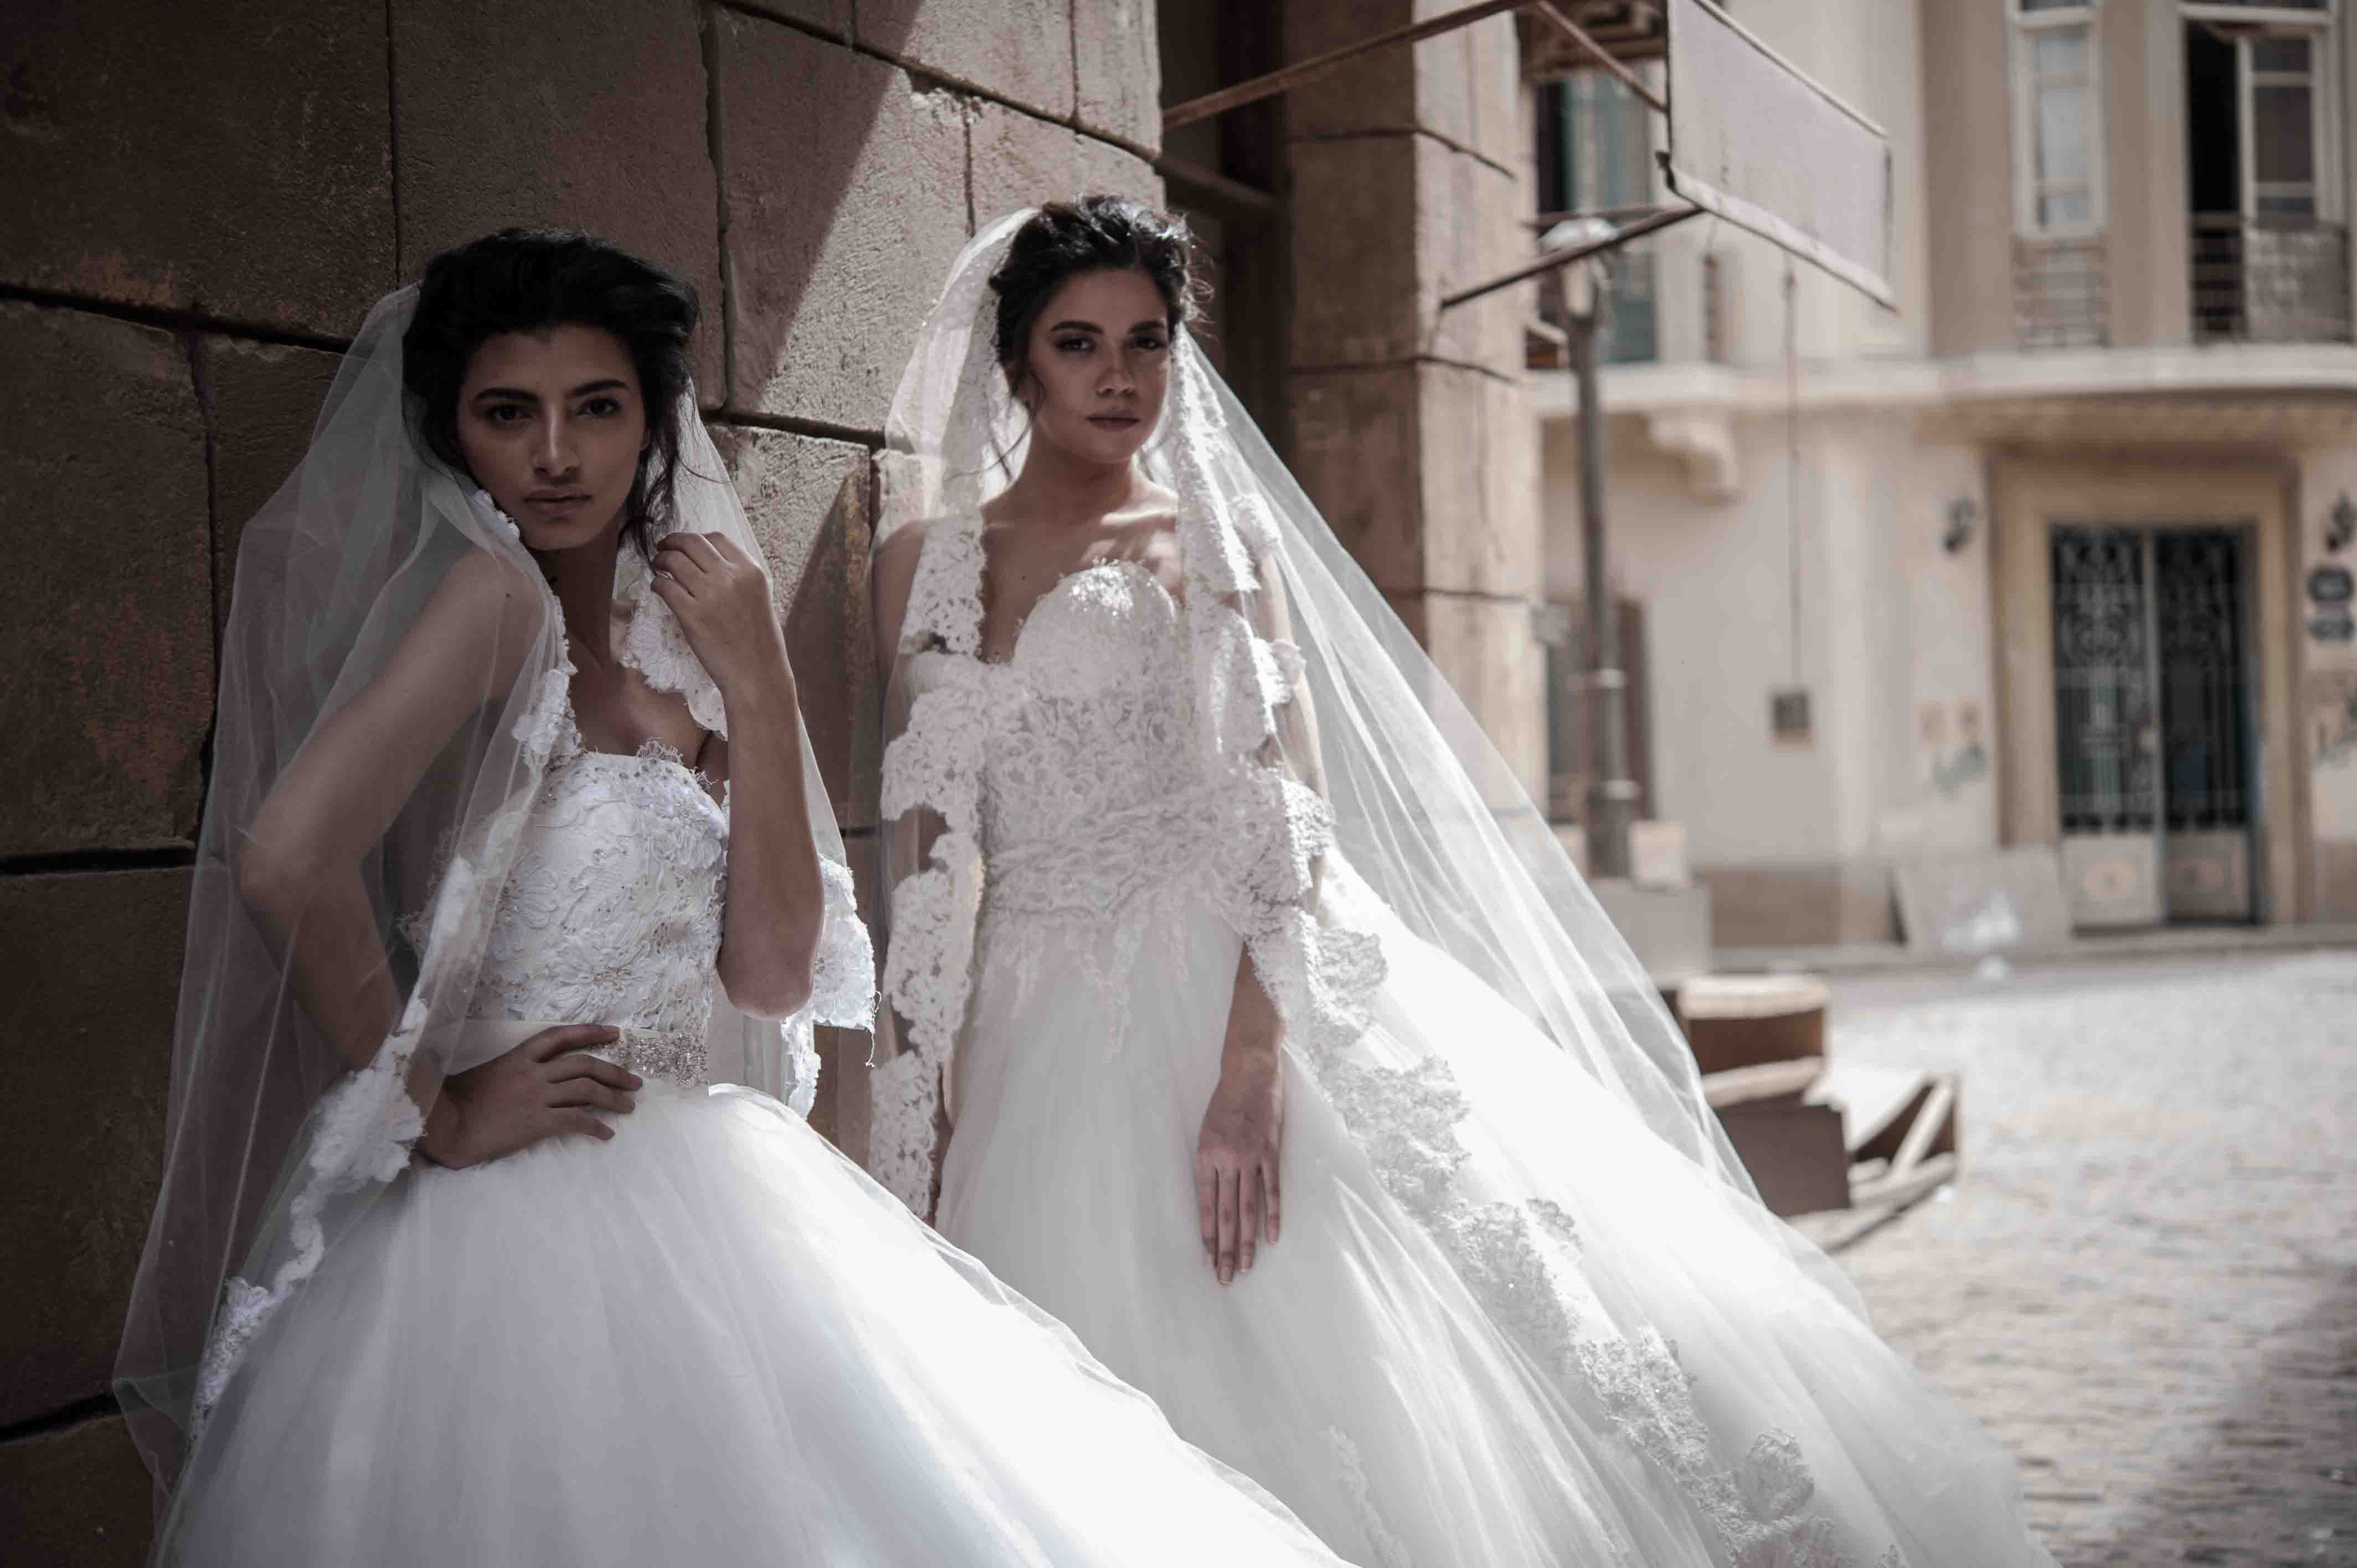 Wedding dresses2-5435-286